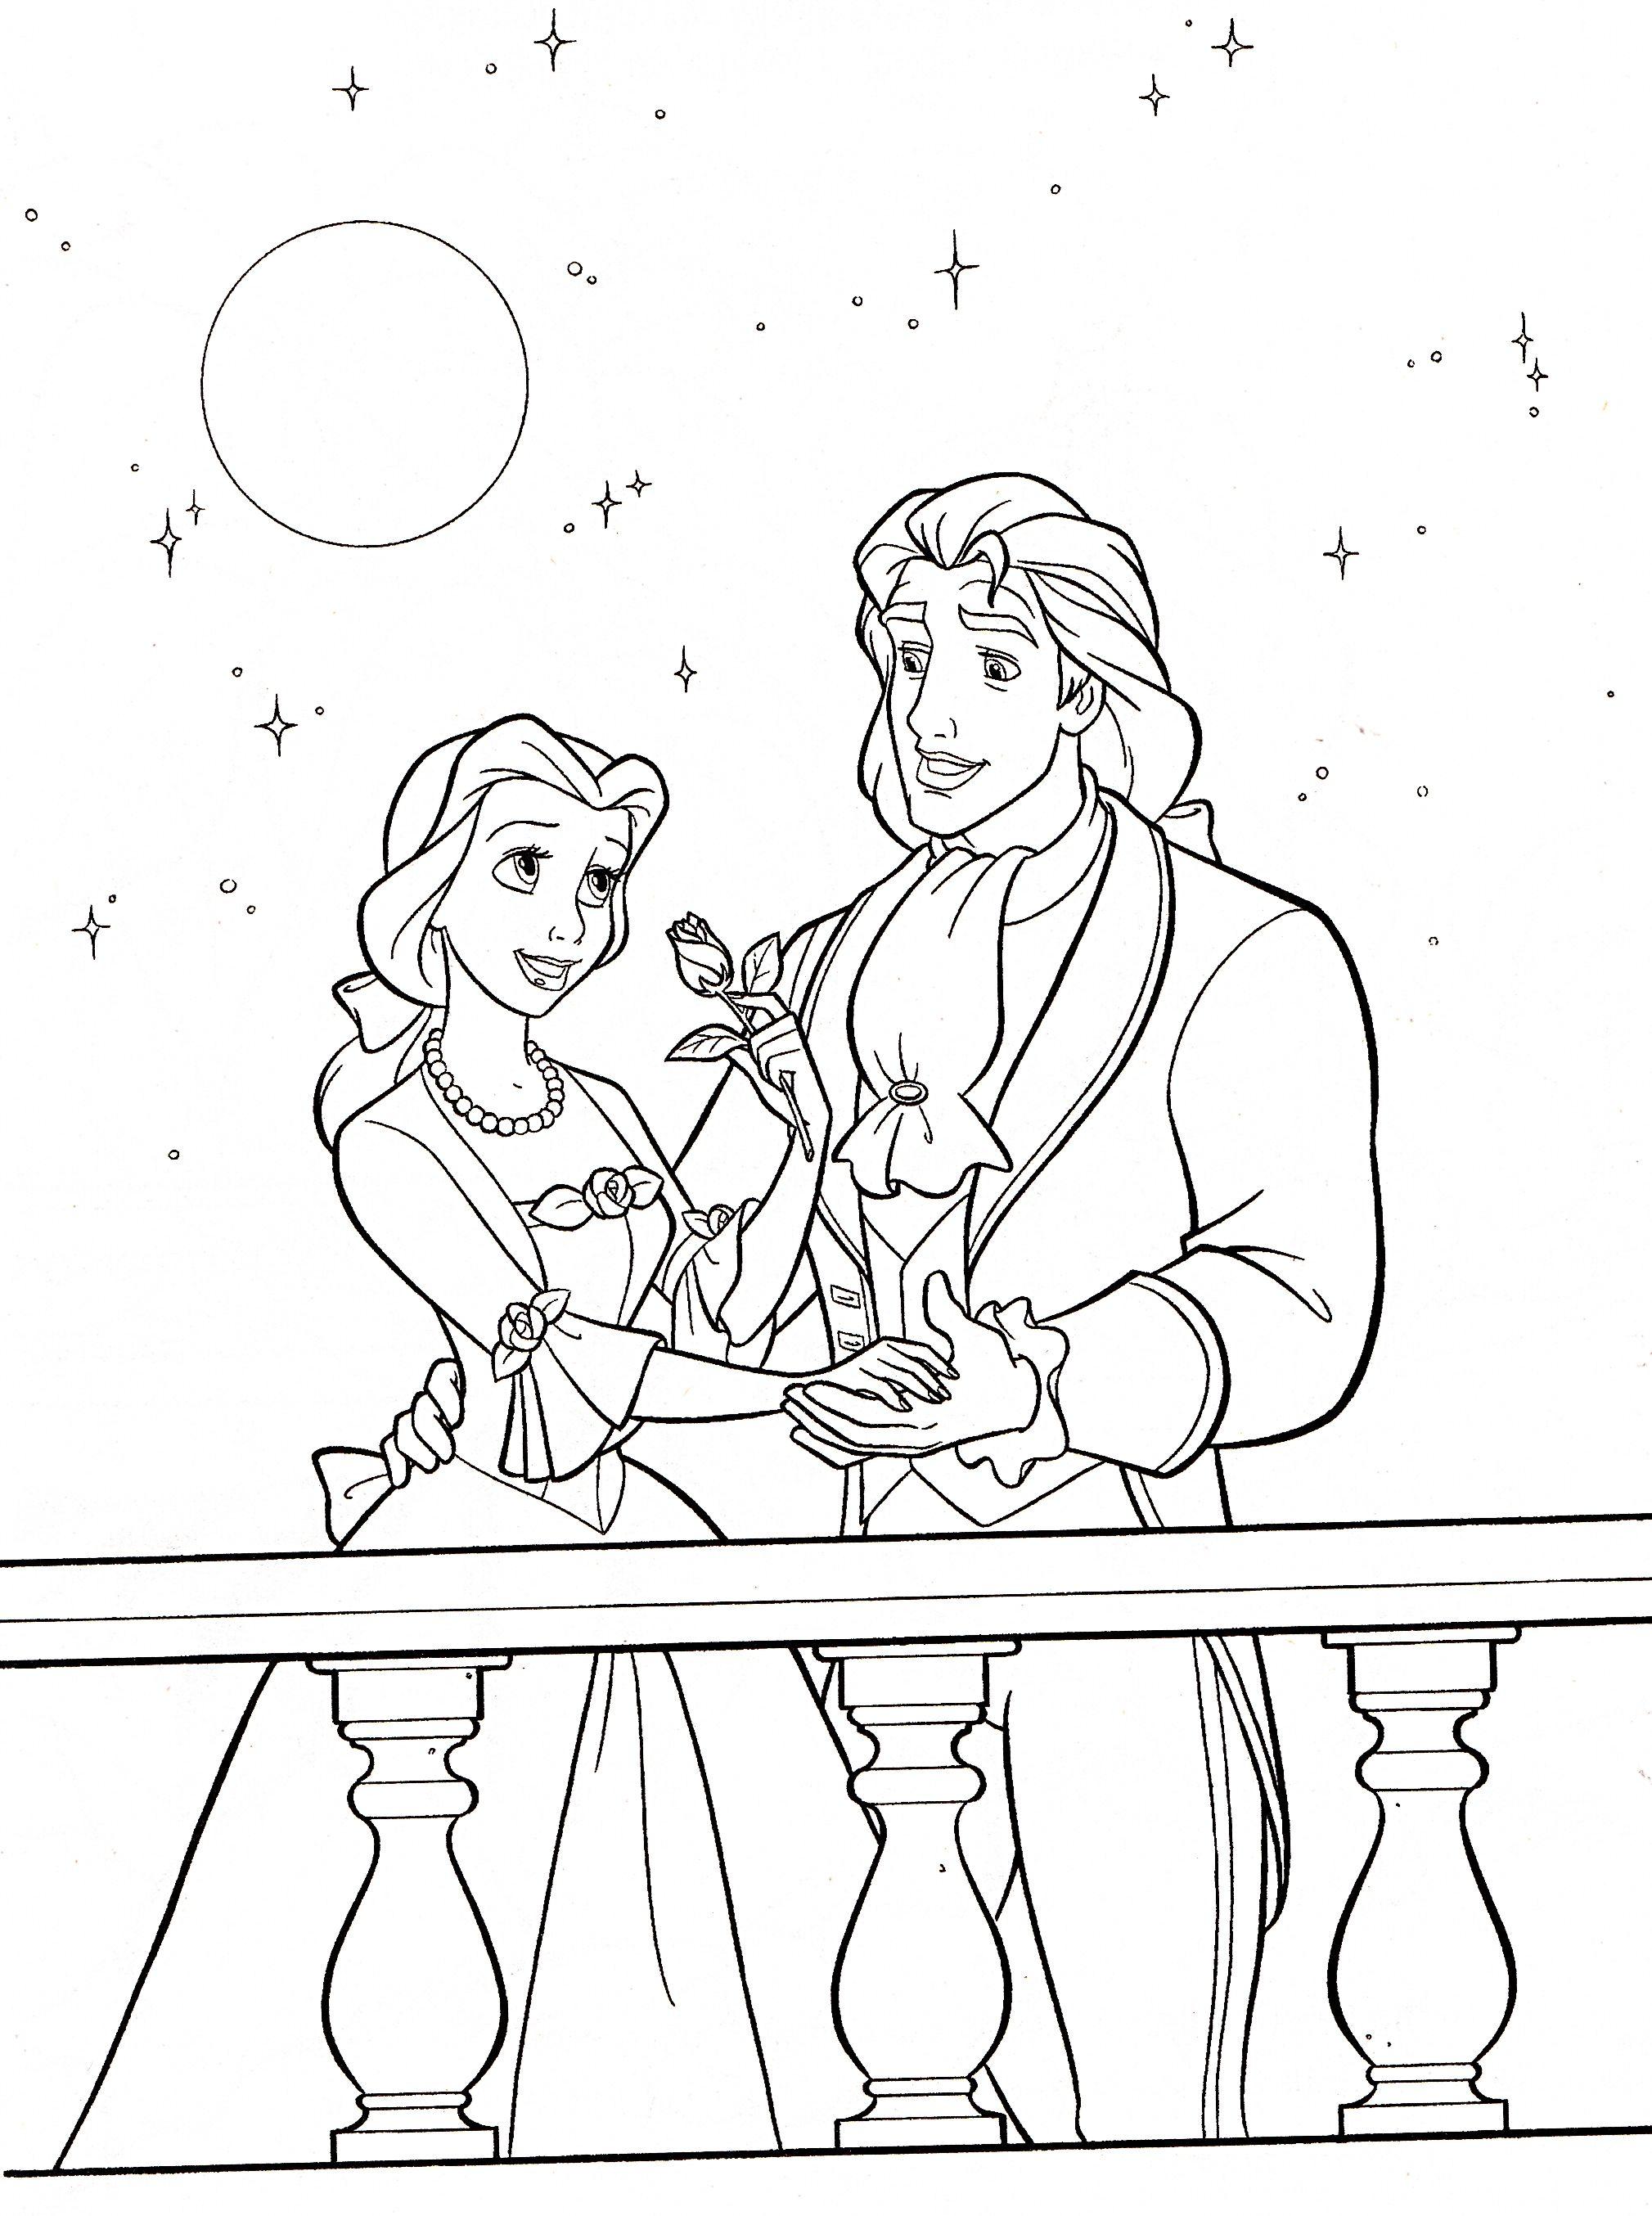 Walt Disney Coloring Pages Princess Belle Prince Adam Disney